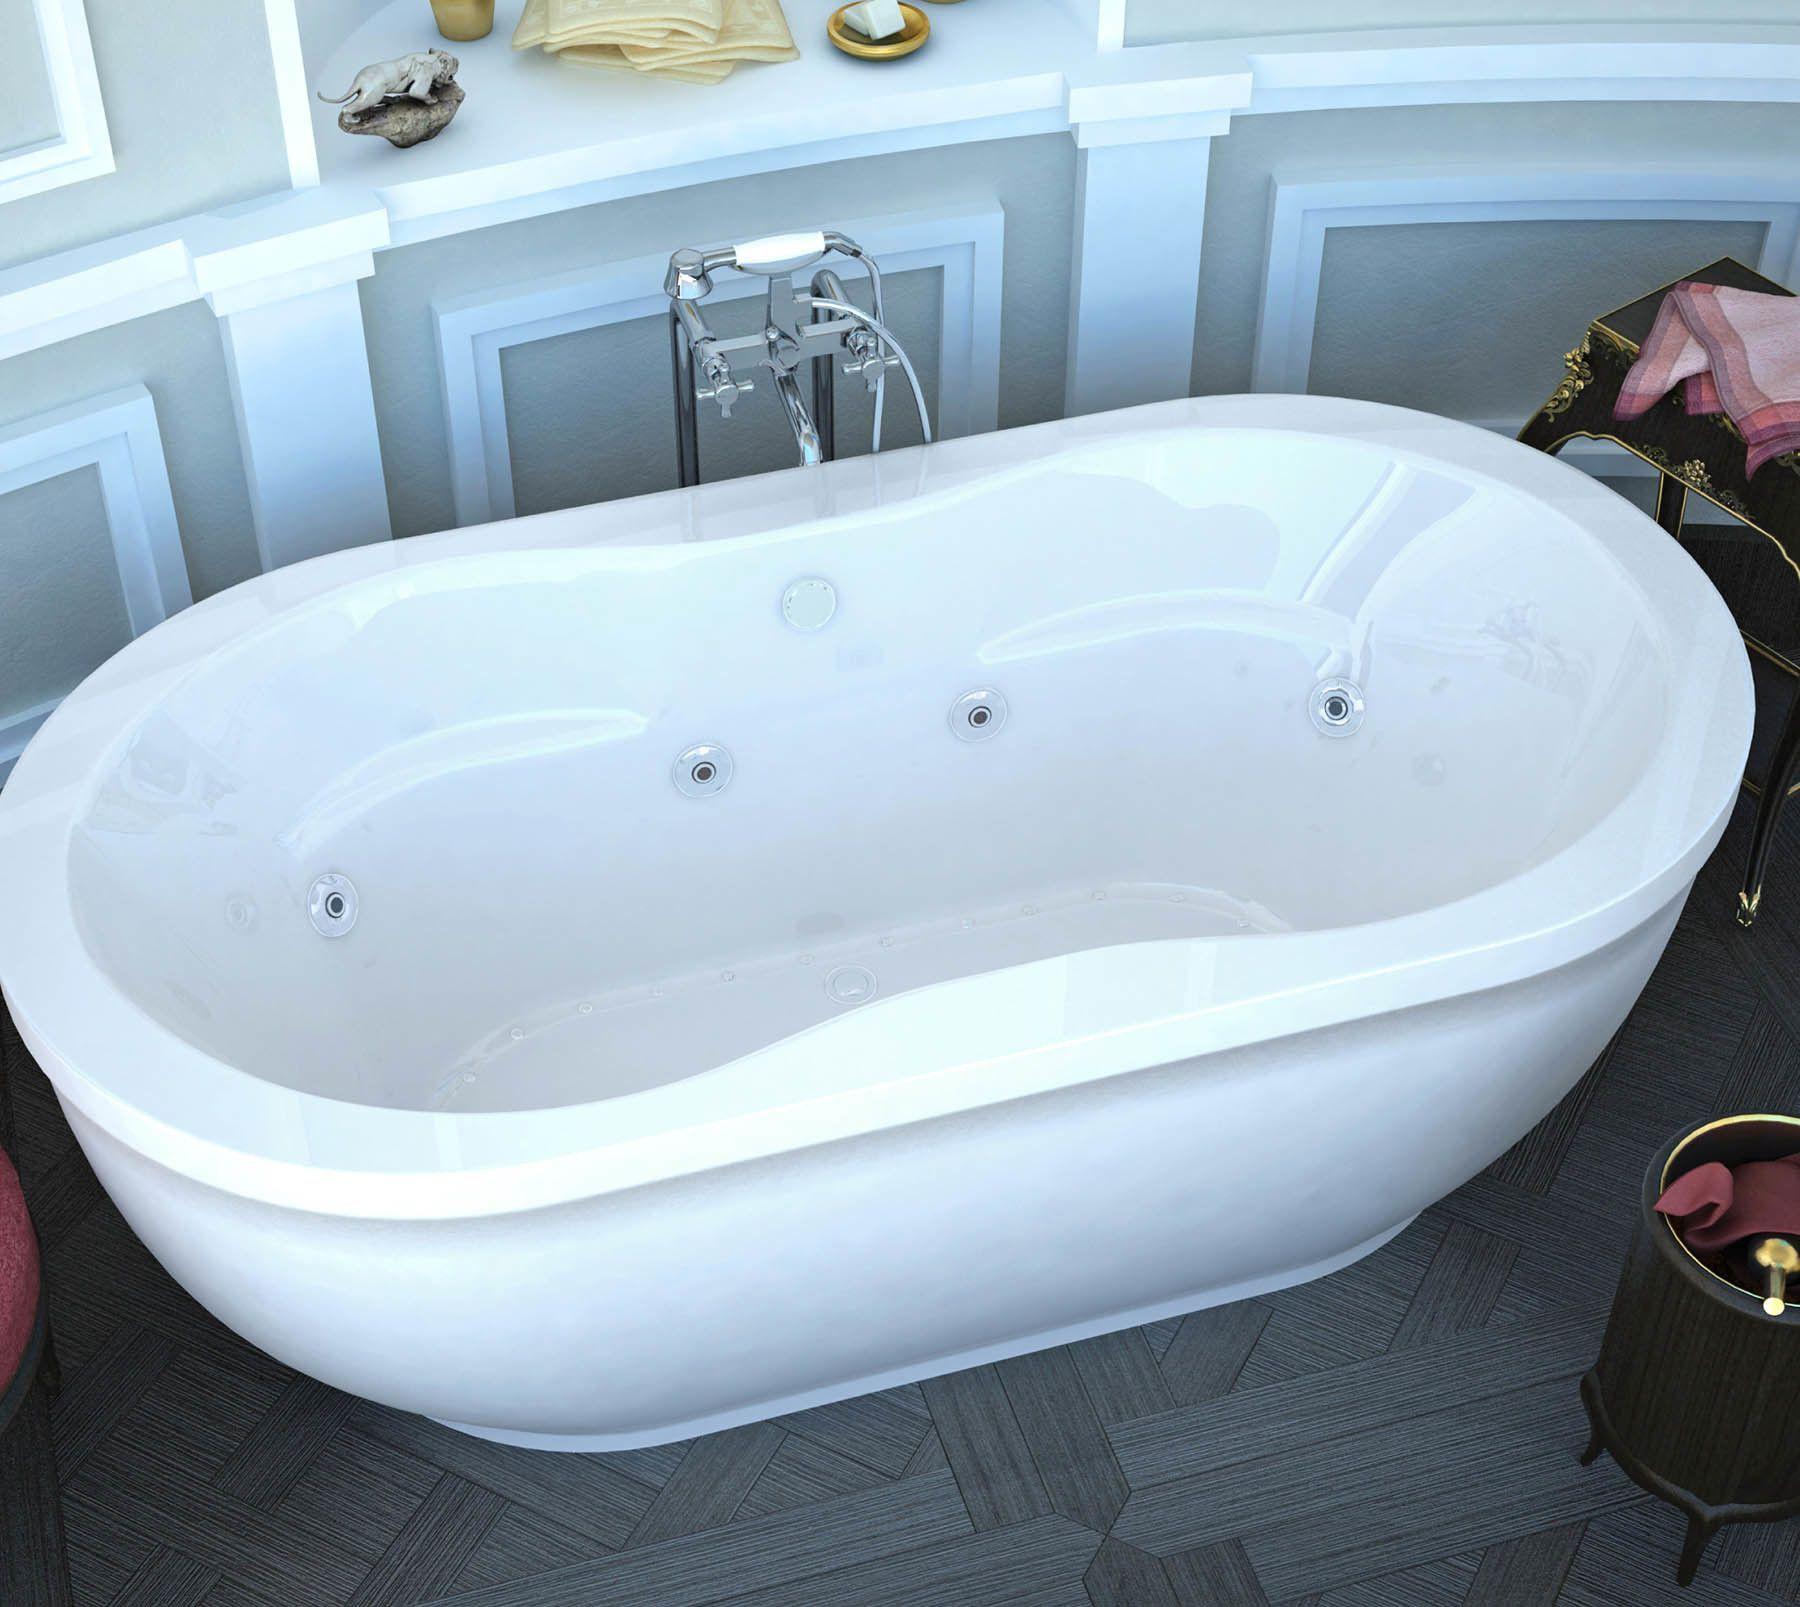 Shultz Air & Whirlpool Water Jetted Bathtub #2personairjetbathtub ...